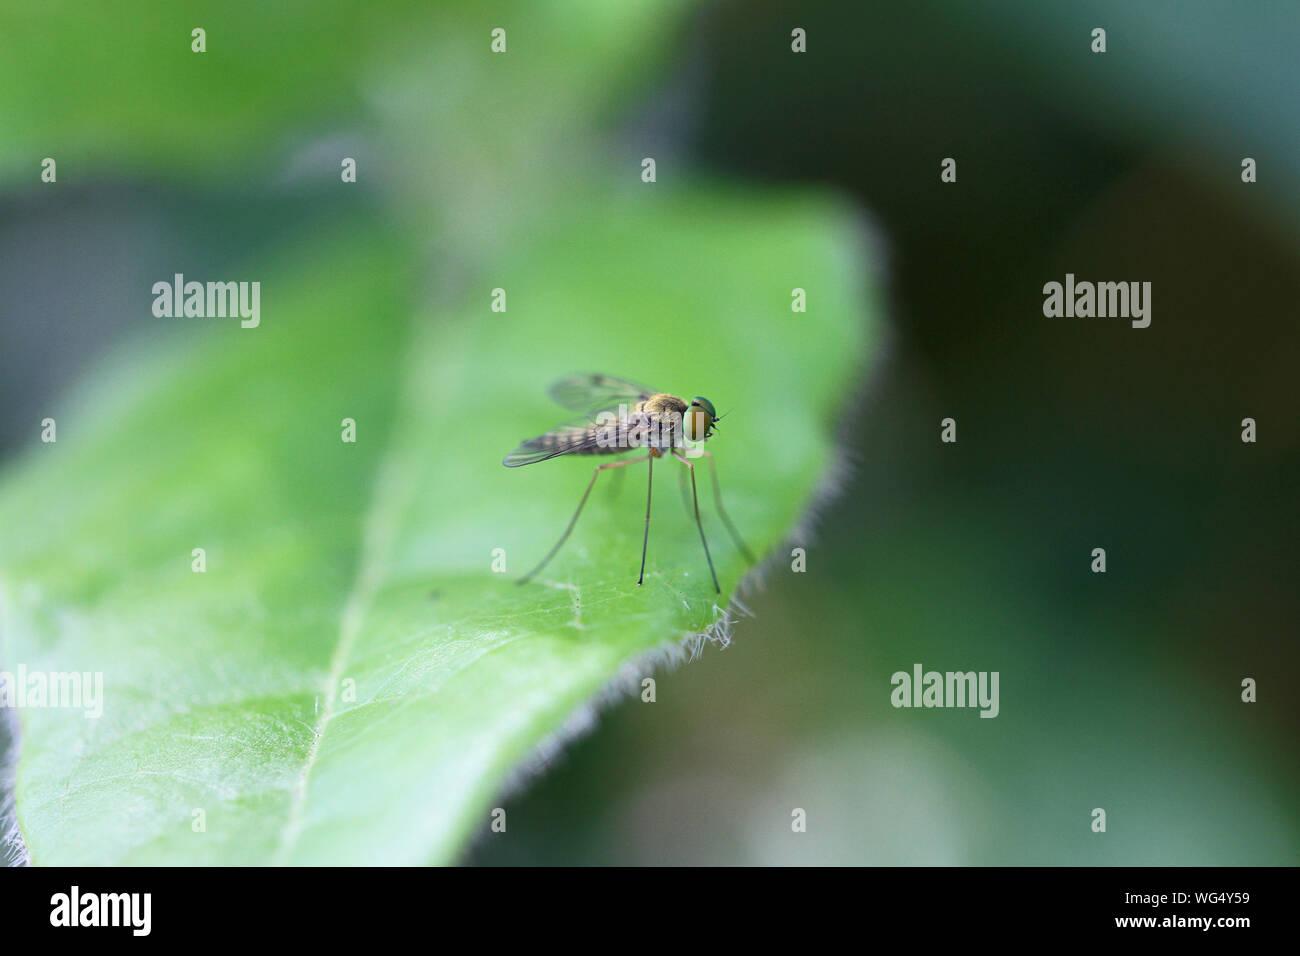 snipe fly chrysopilus asiliformis in the rhagio group of flies the rhagionidae family not rhagio scolopacea at rest on a viburnum tinus or laurustinus Stock Photo